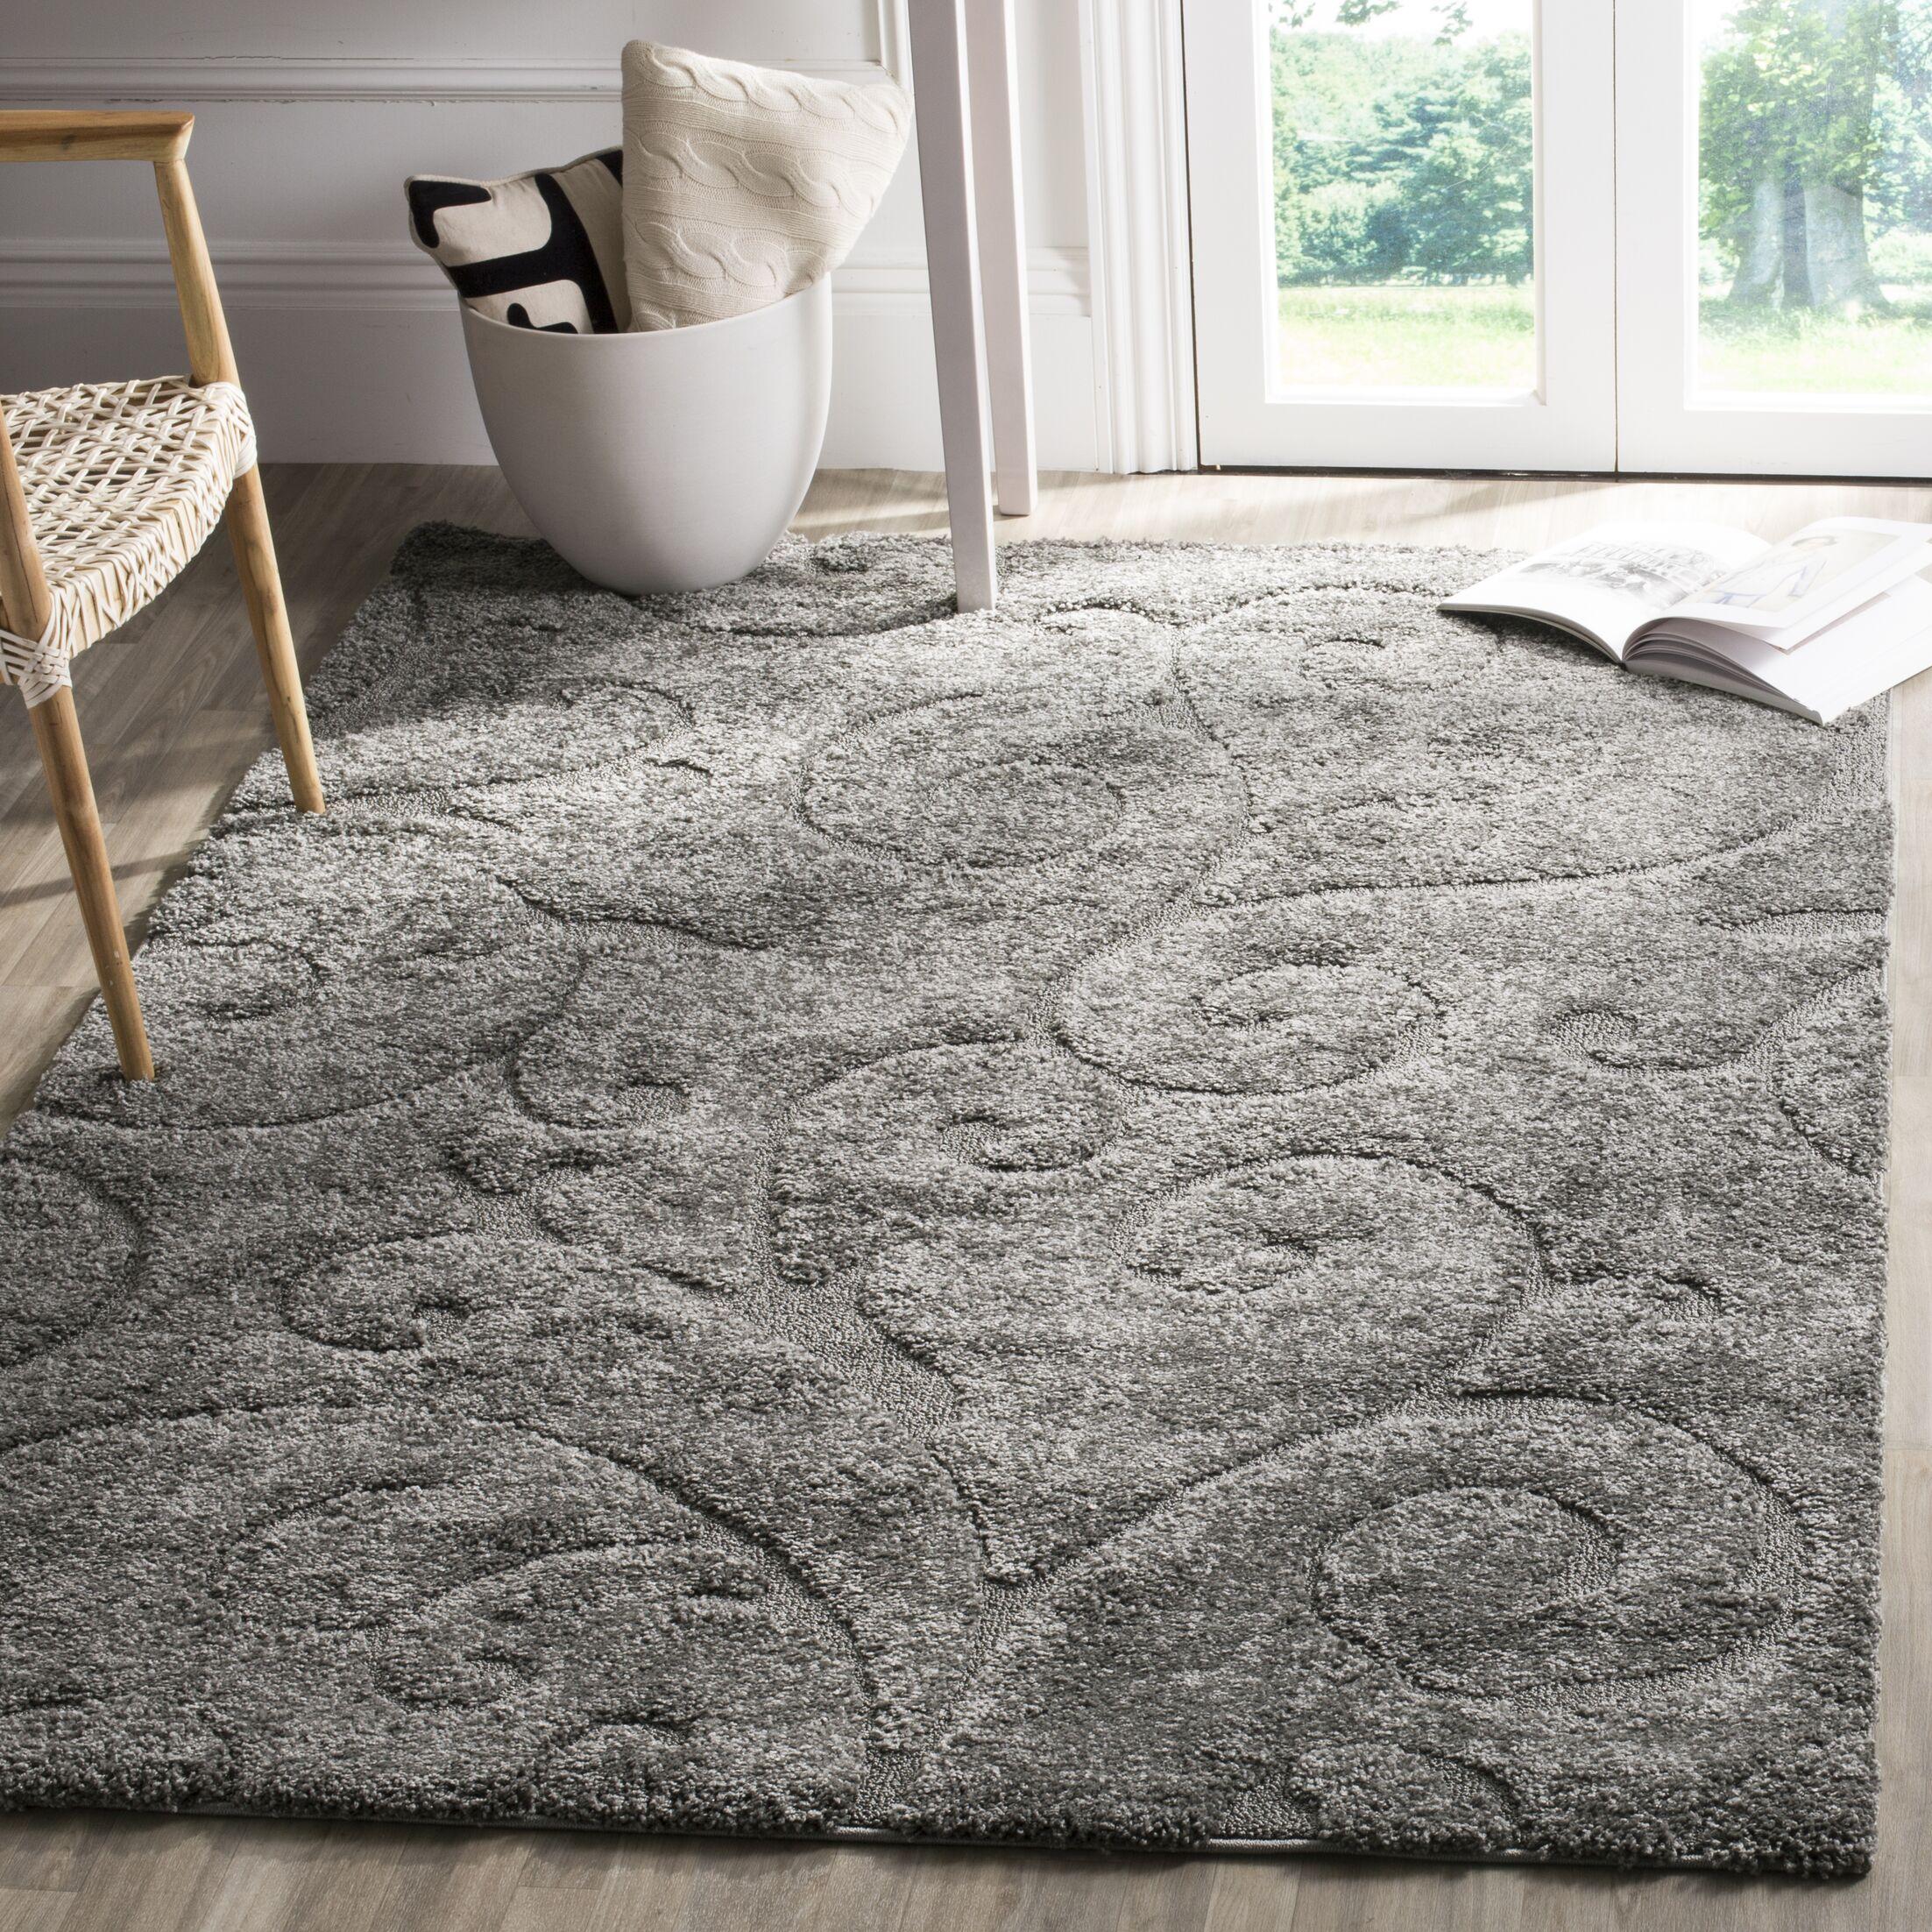 Biller Swirl Gray/Beige Area Rug Rug Size: Rectangle 4' x 6'